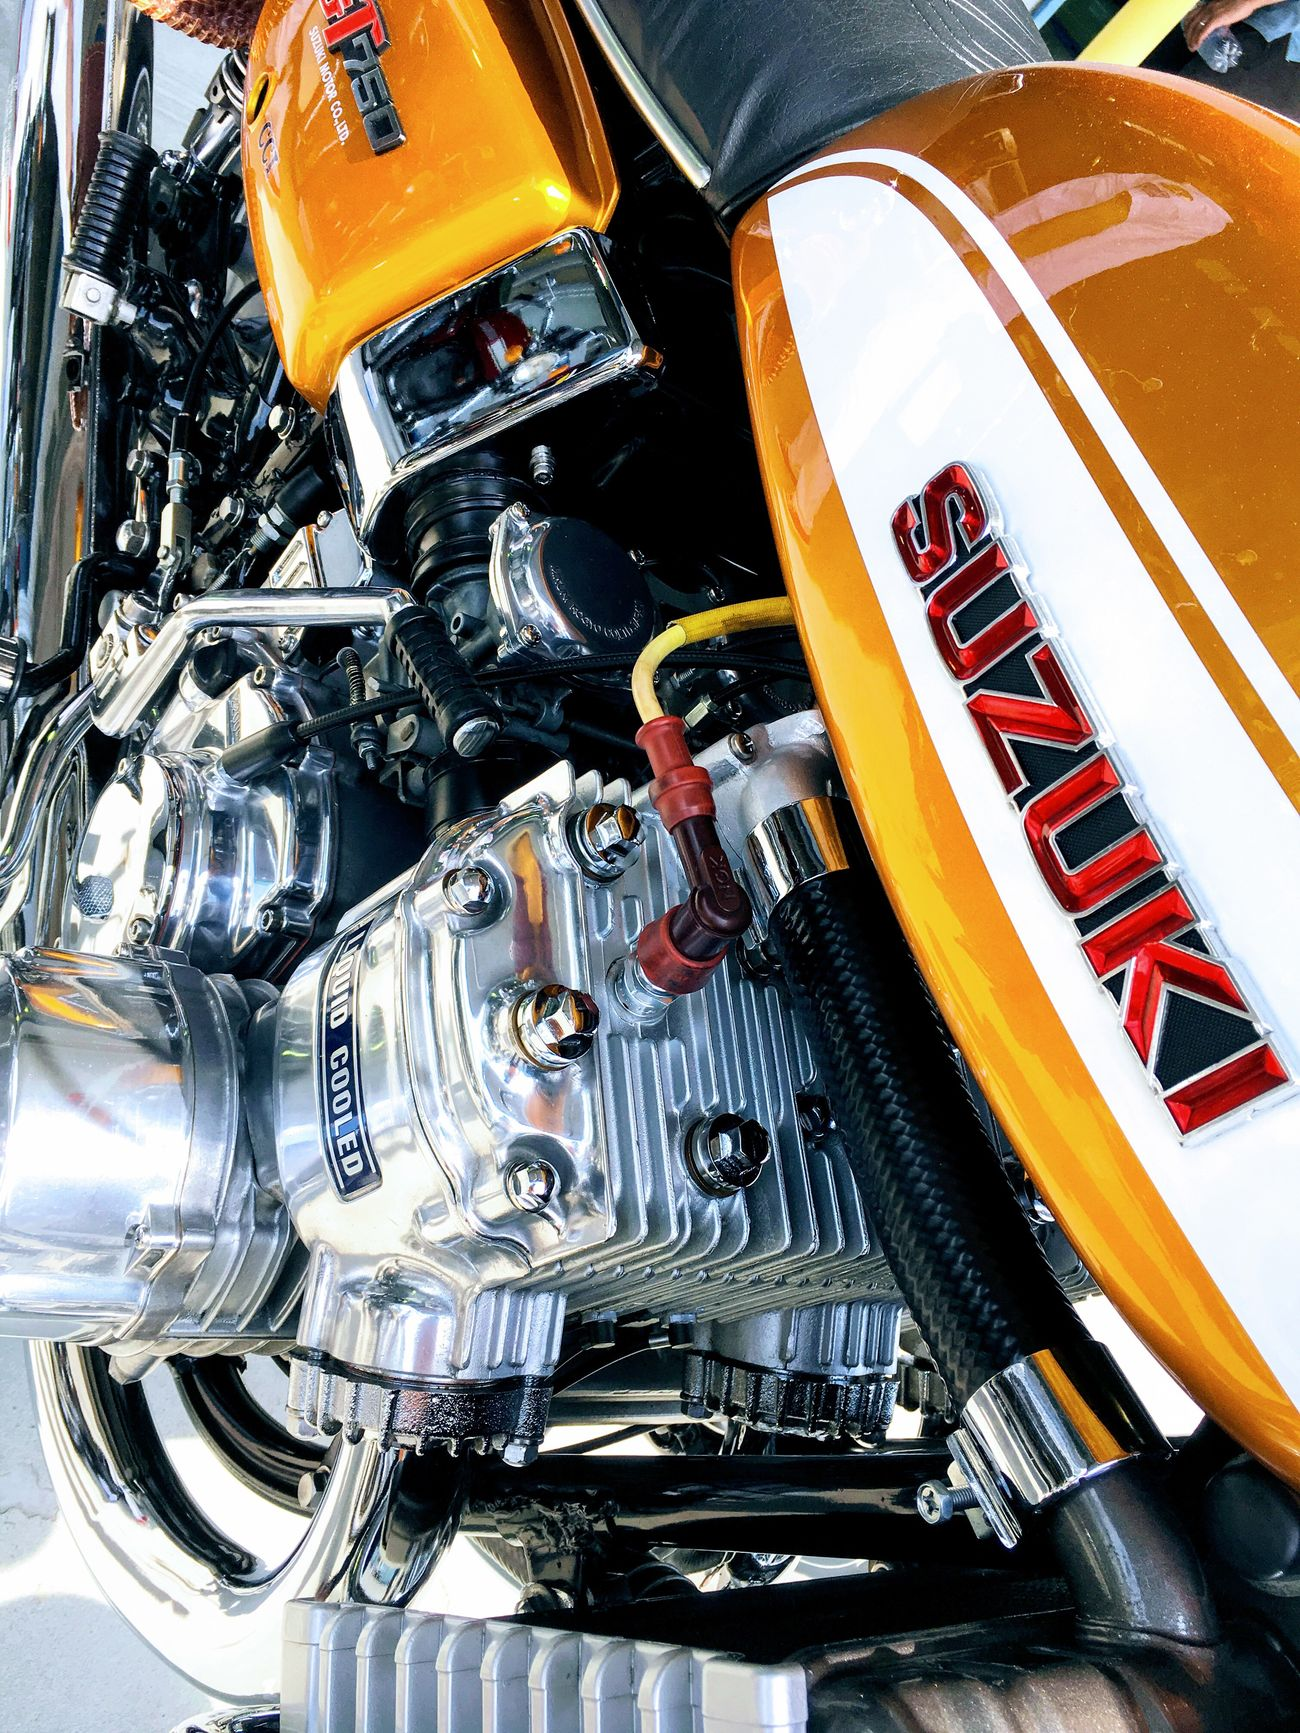 SUZUKI GT750 Motorcycle Japan